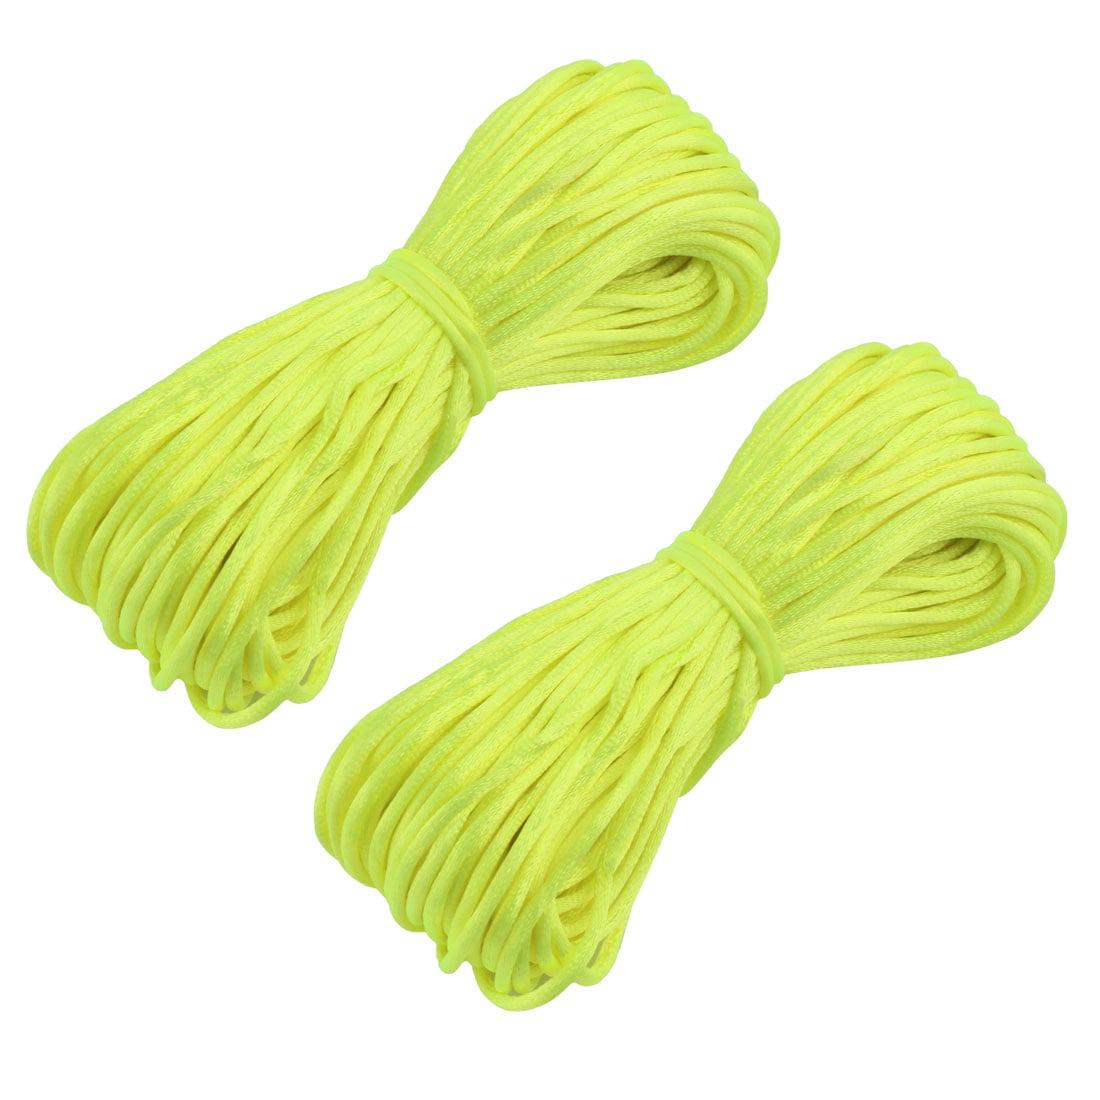 Festival Nylon Craft DIY Chinese Knot Cord String Green Yellow 22 Yards 2pcs